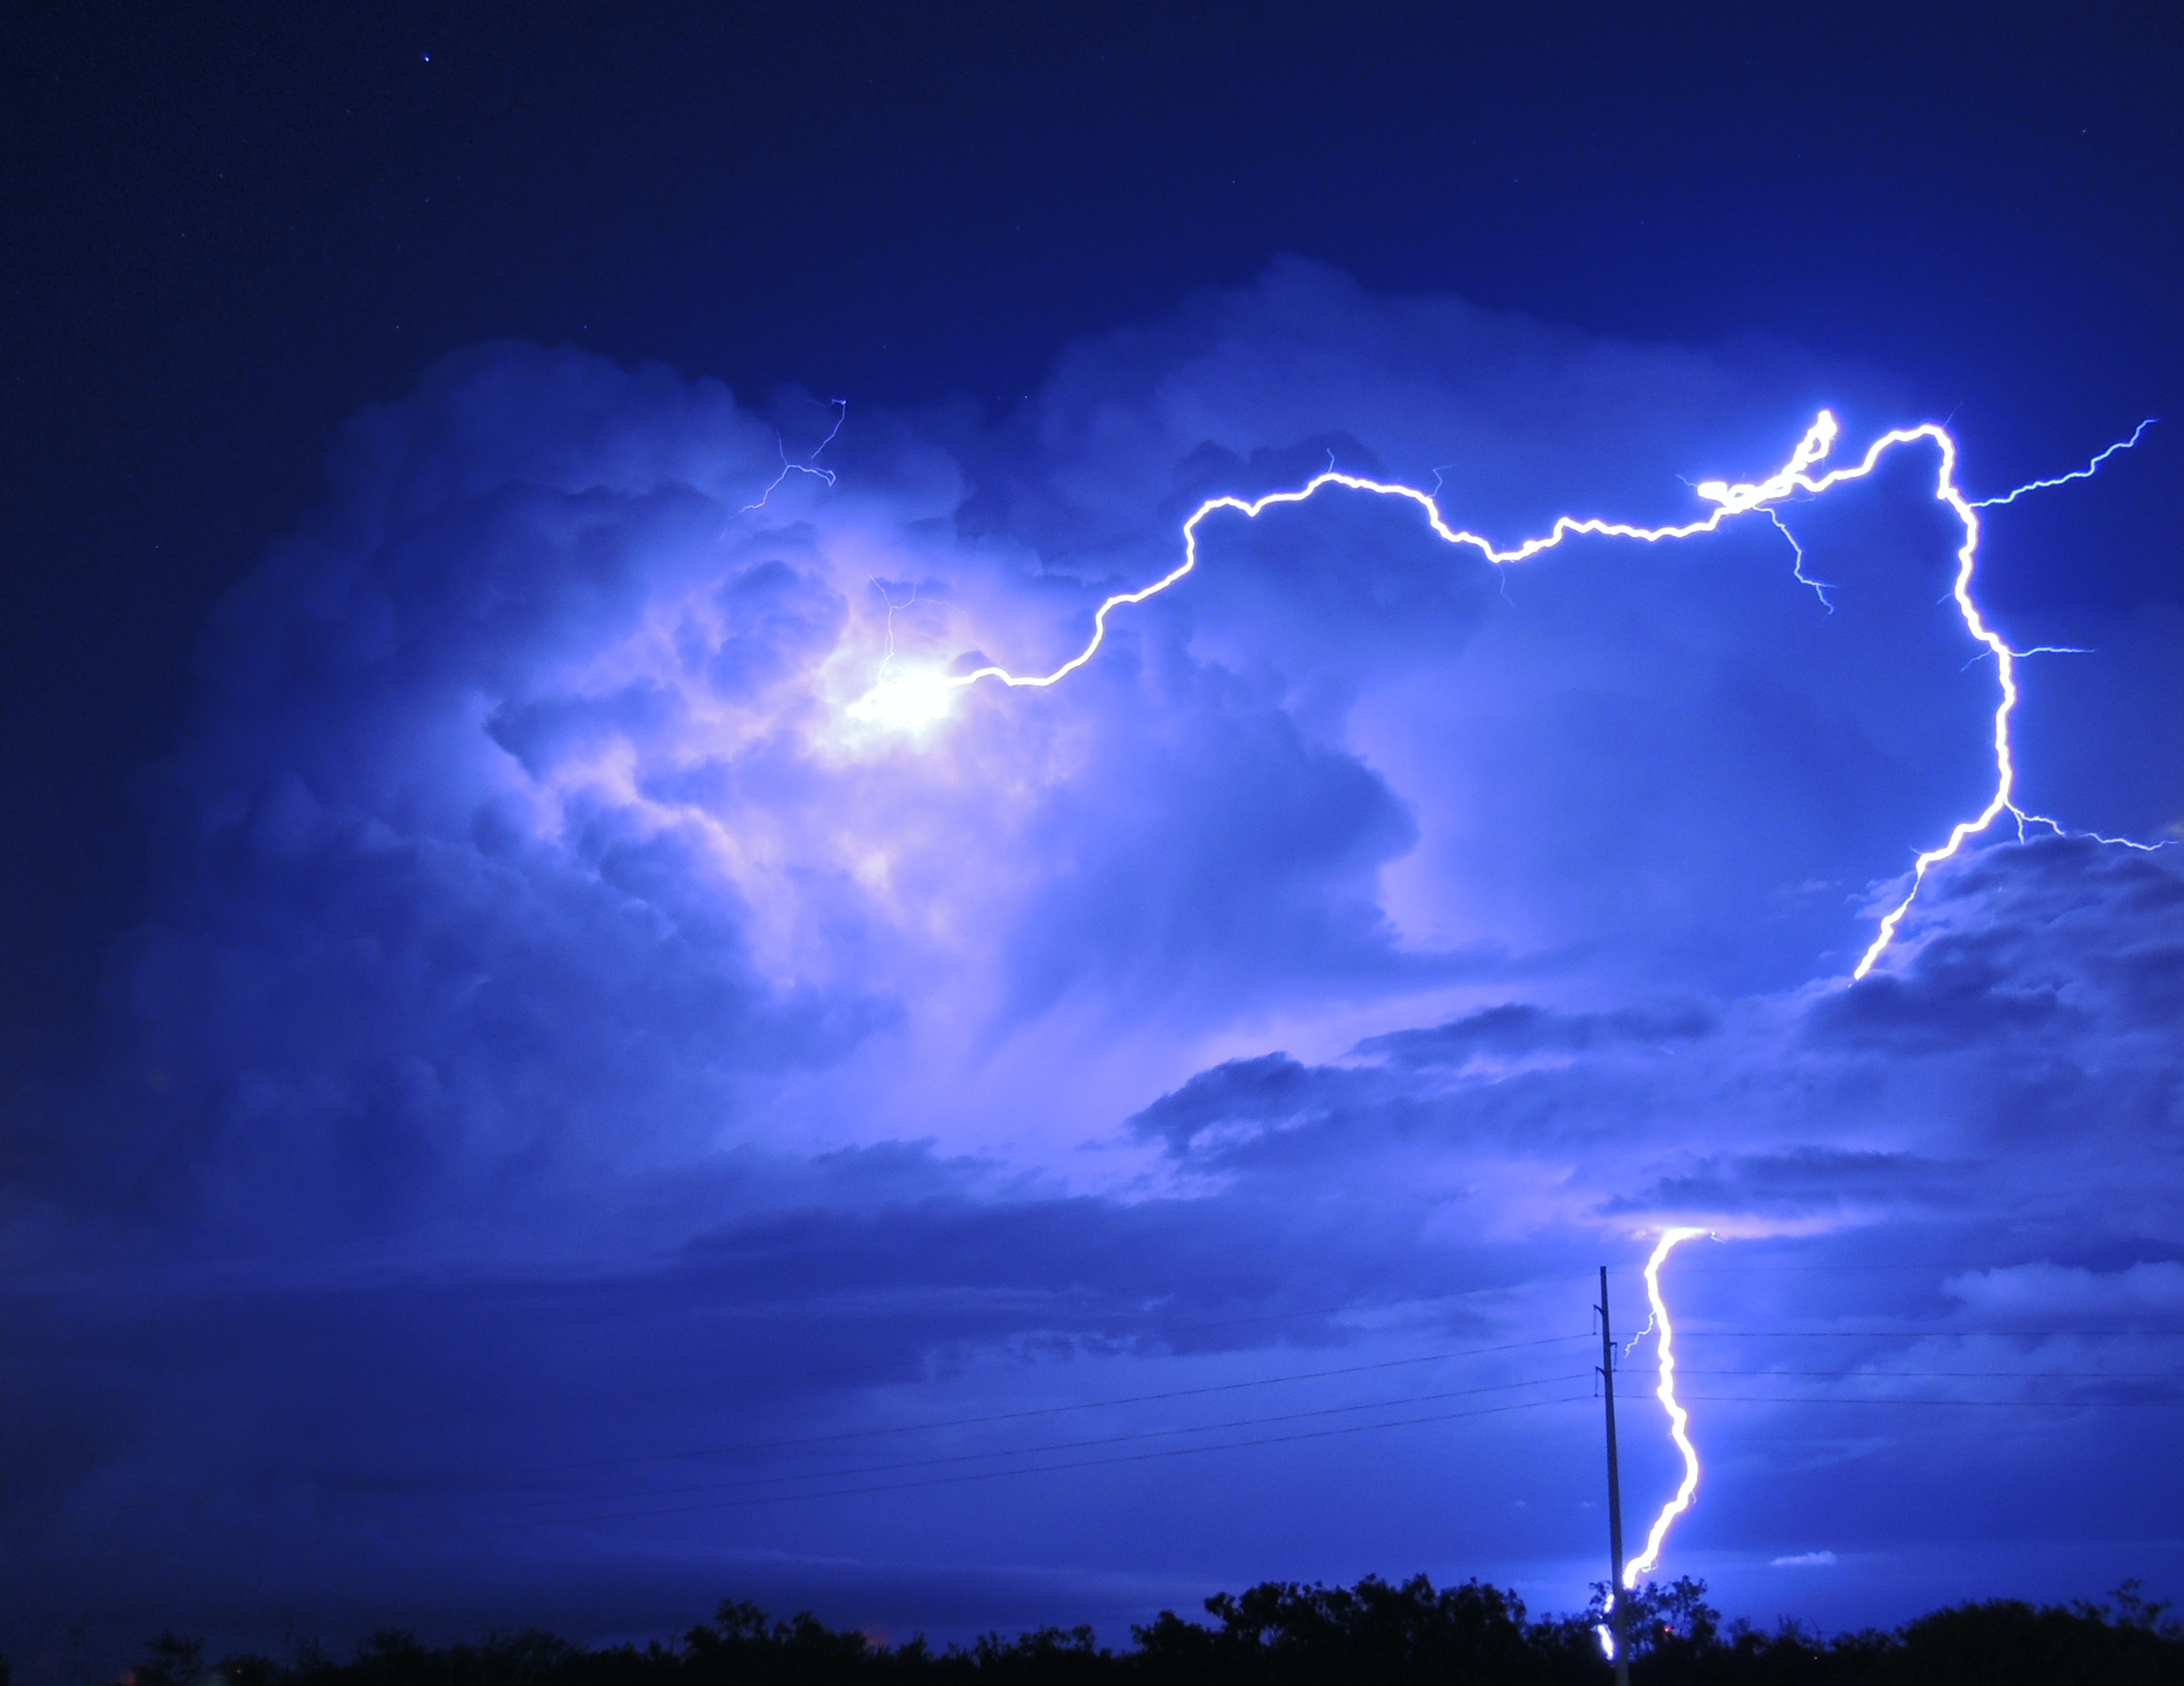 Thunder Bolt Lightning 2997462 Hd Wallpaper Backgrounds Download